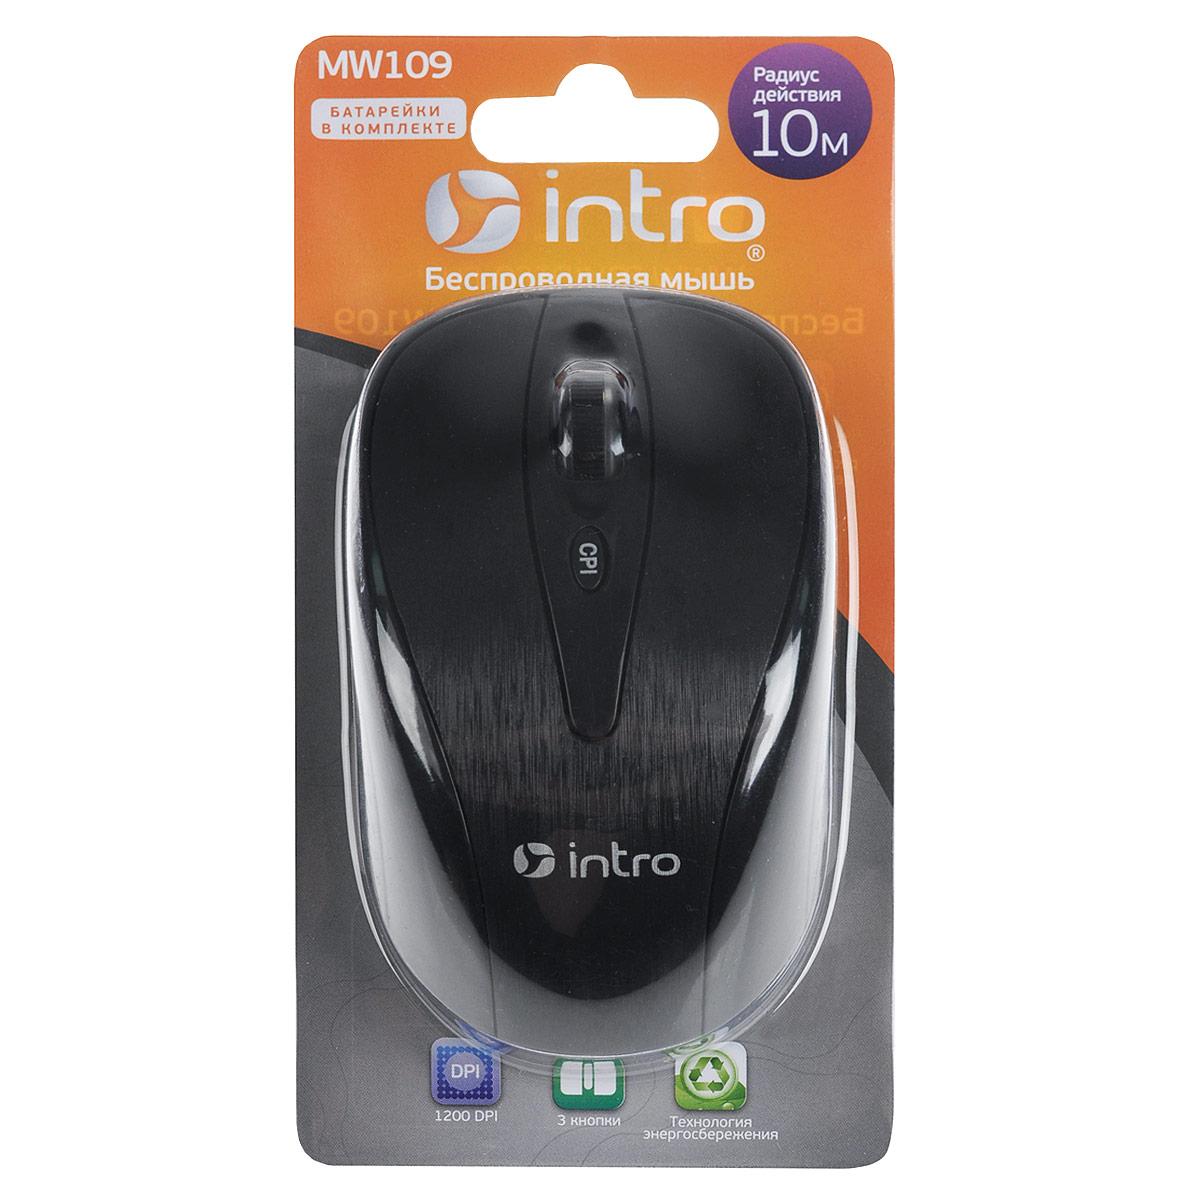 лучшая цена Мышь Intro MW109 Wireless